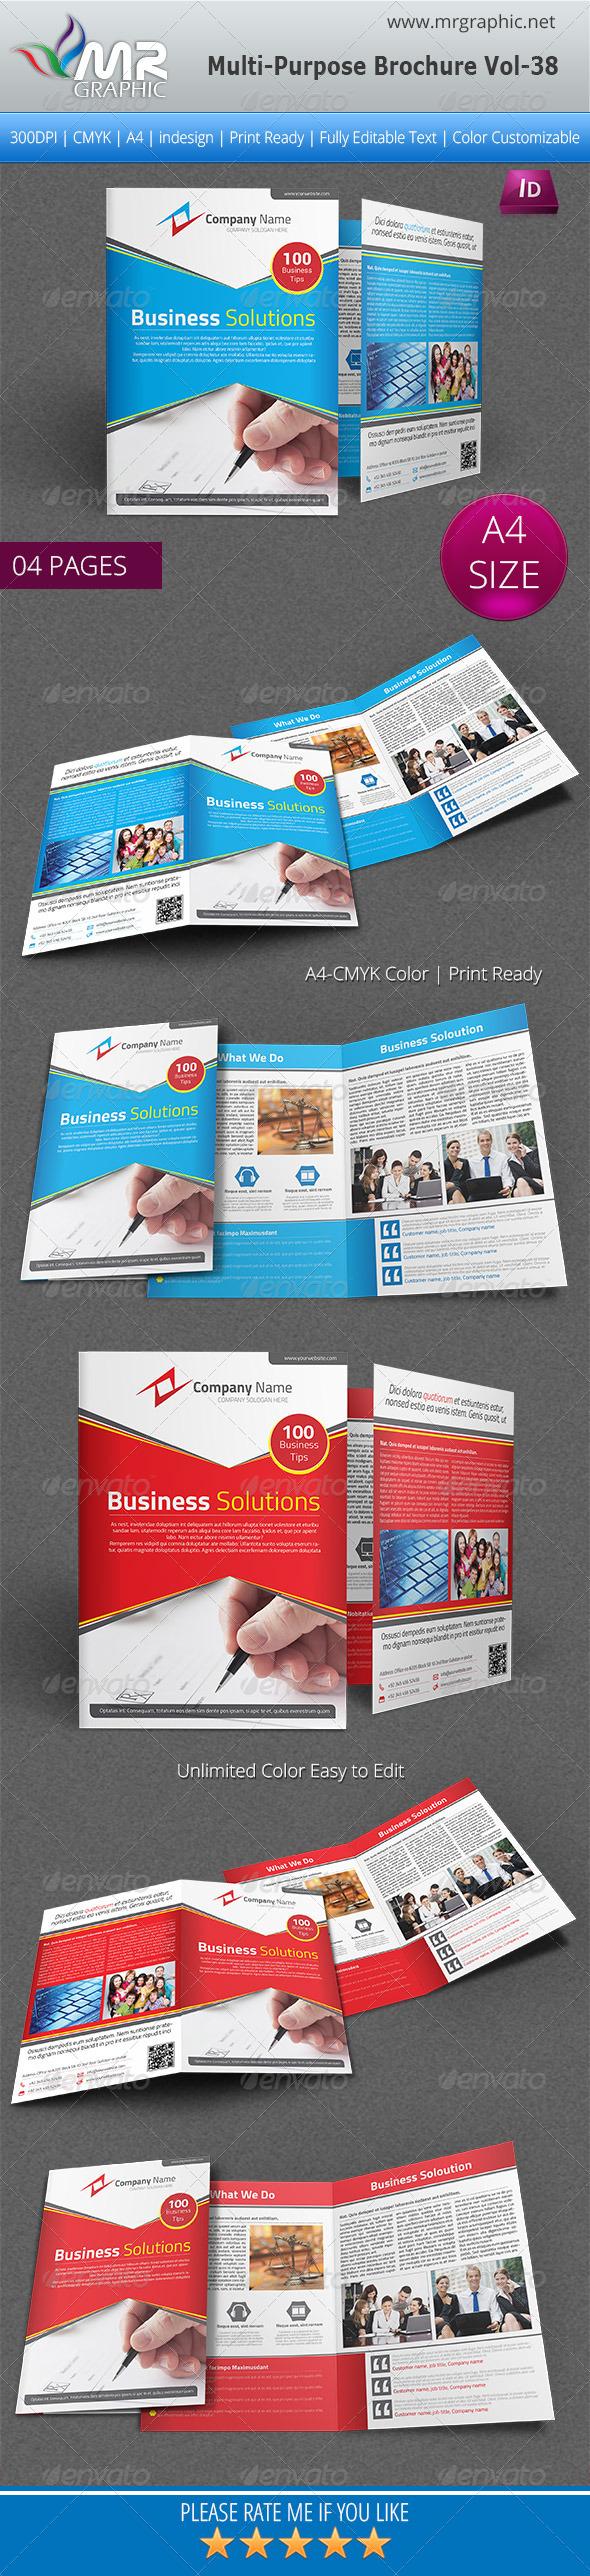 Multipurpose Bi-fold Brochure Template Vol-38 - Corporate Brochures